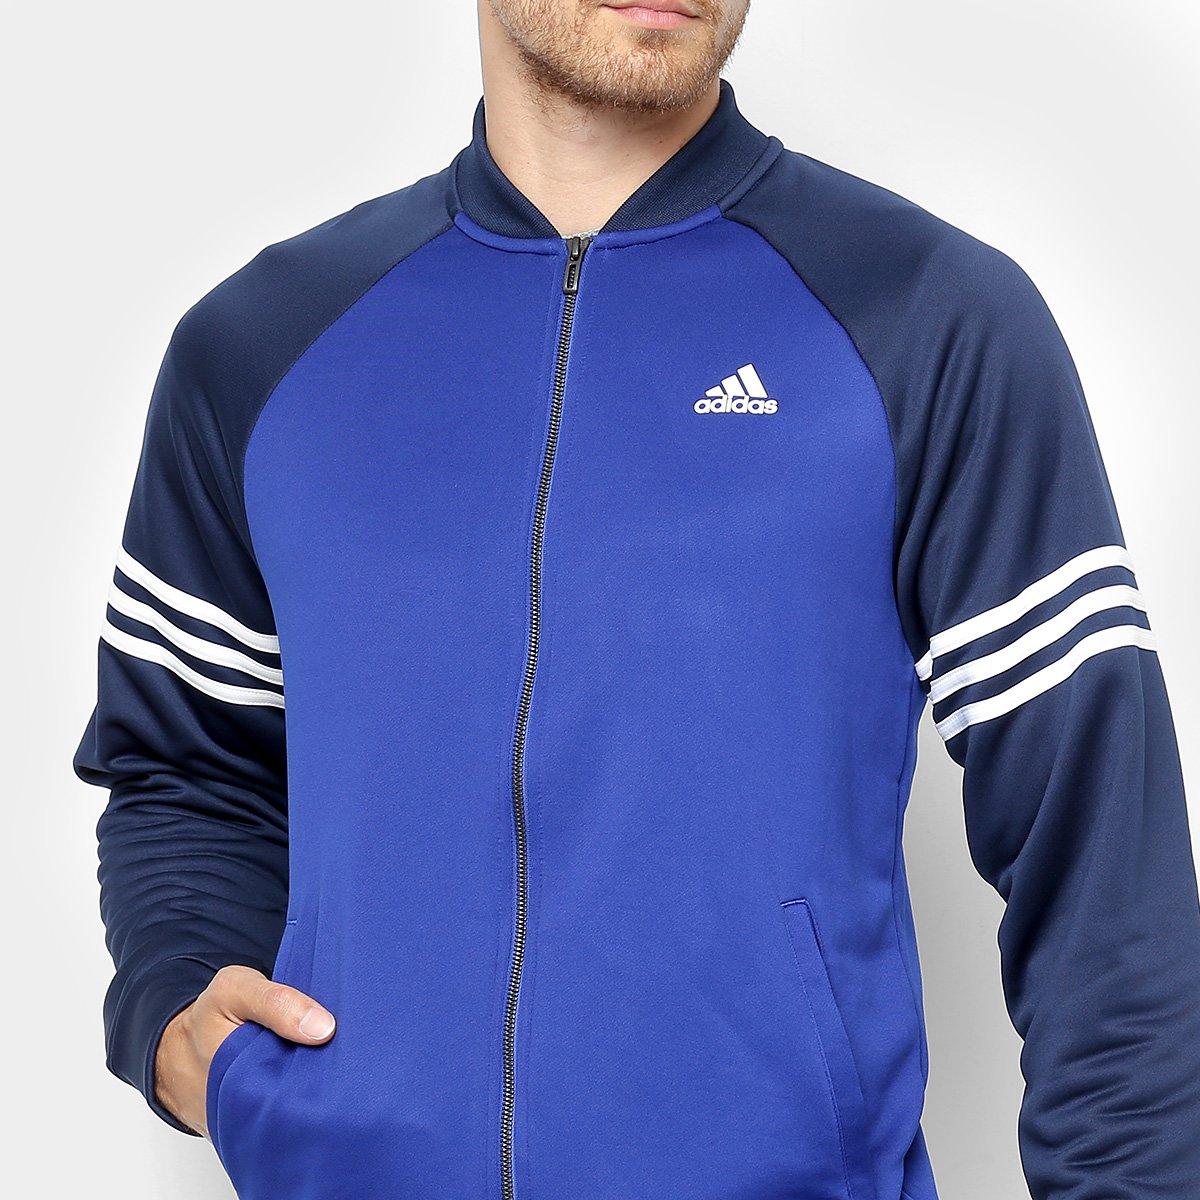 ... Agasalho Adidas Cozy Masculino. Agasalho Adidas Cozy Masculino - Azul+ Marinho 264fc08bd4cba